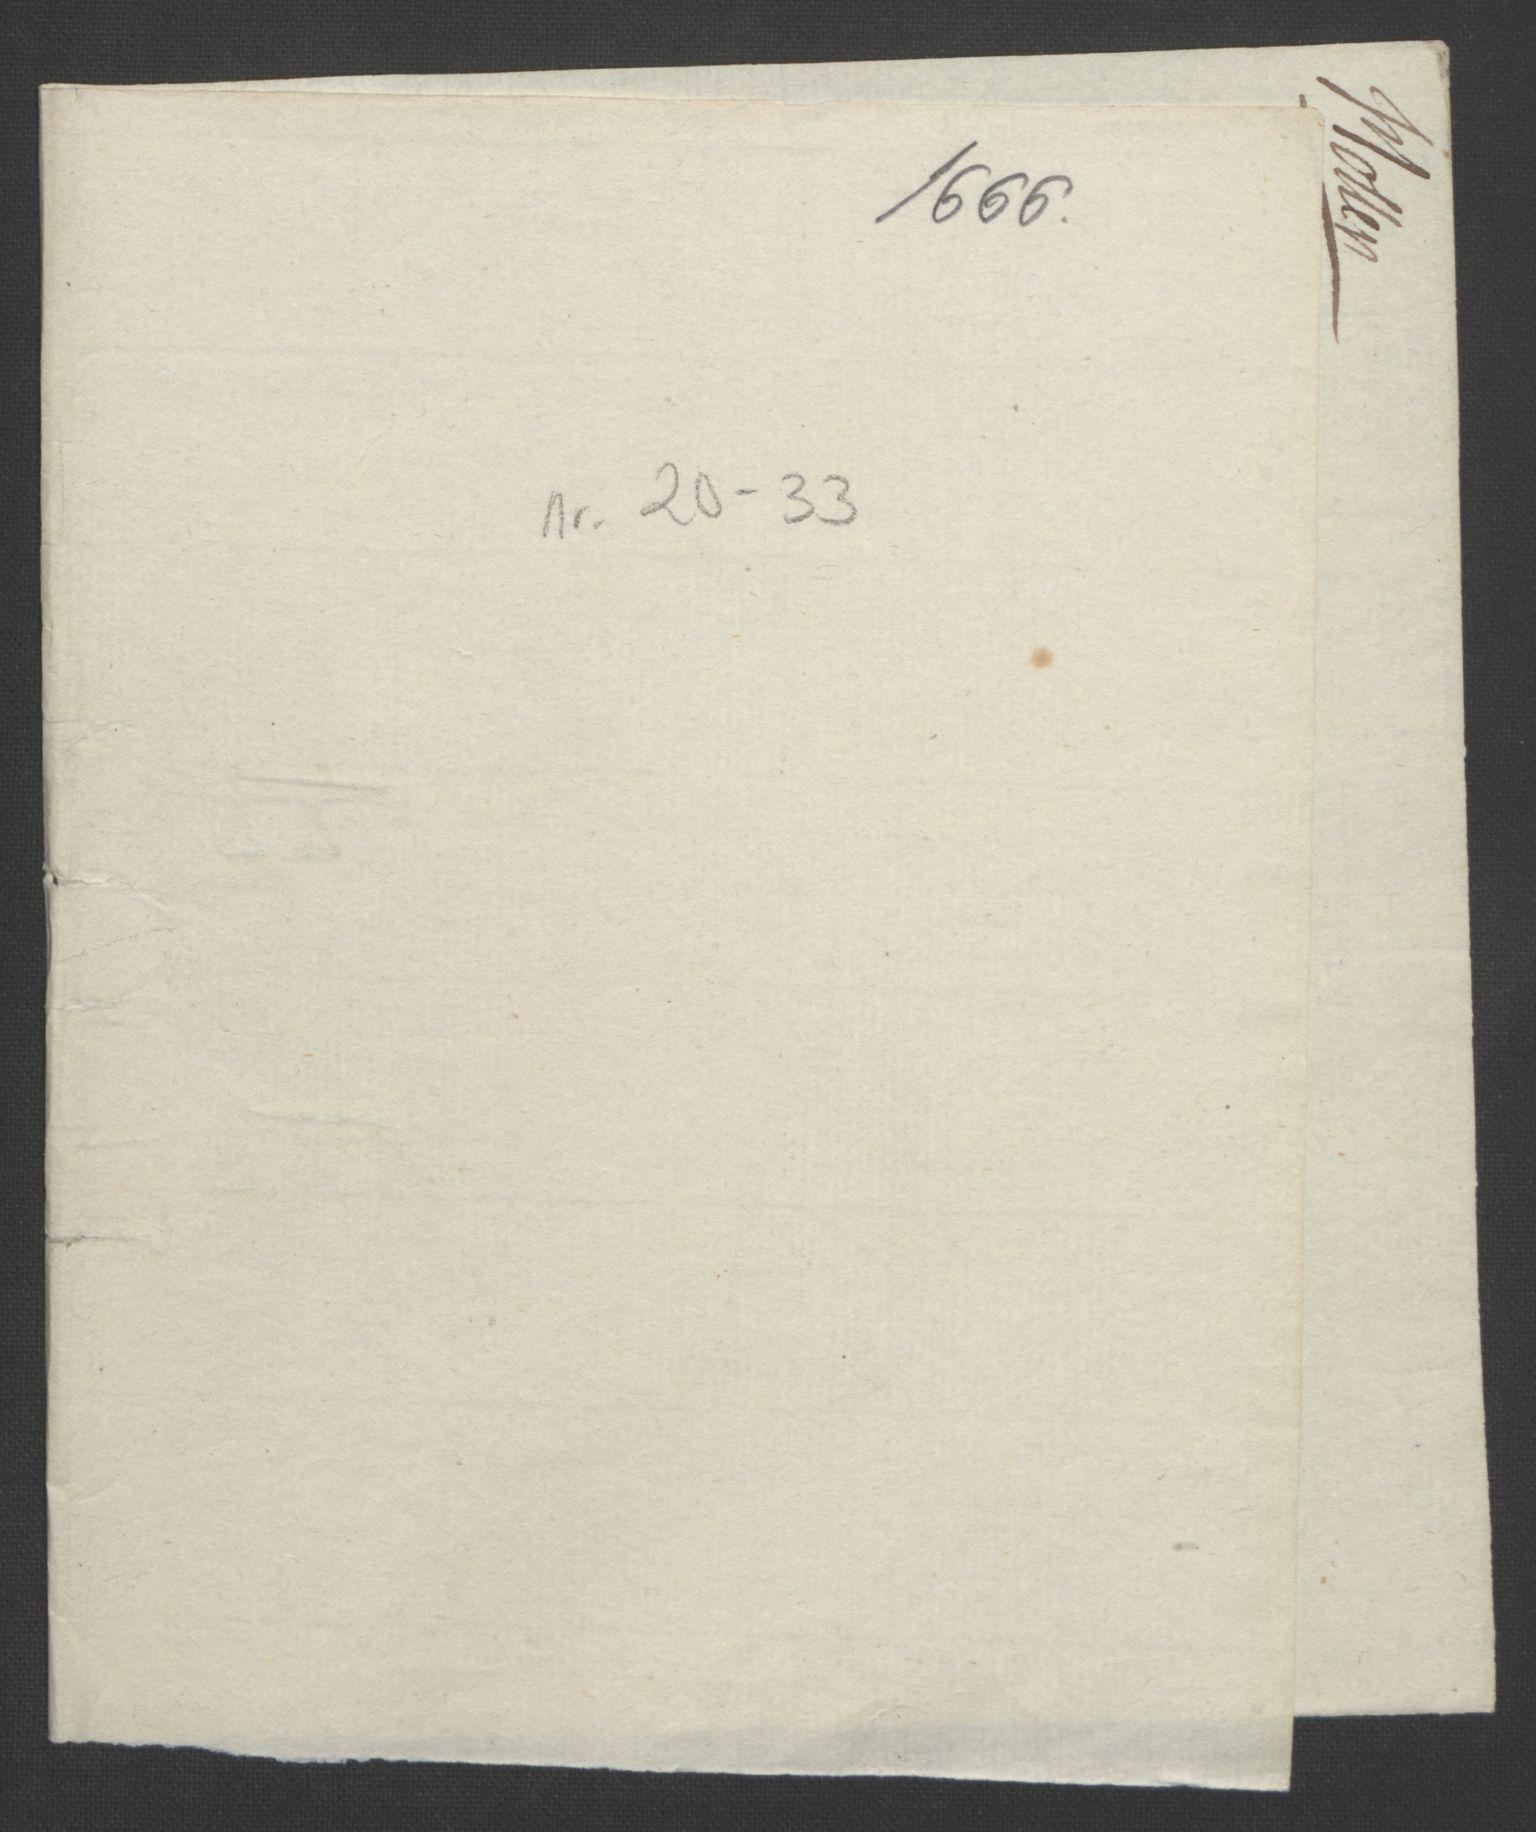 RA, Rentekammeret inntil 1814, Reviderte regnskaper, Fogderegnskap, R32/L1842: Fogderegnskap Jarlsberg grevskap, 1664-1673, s. 48